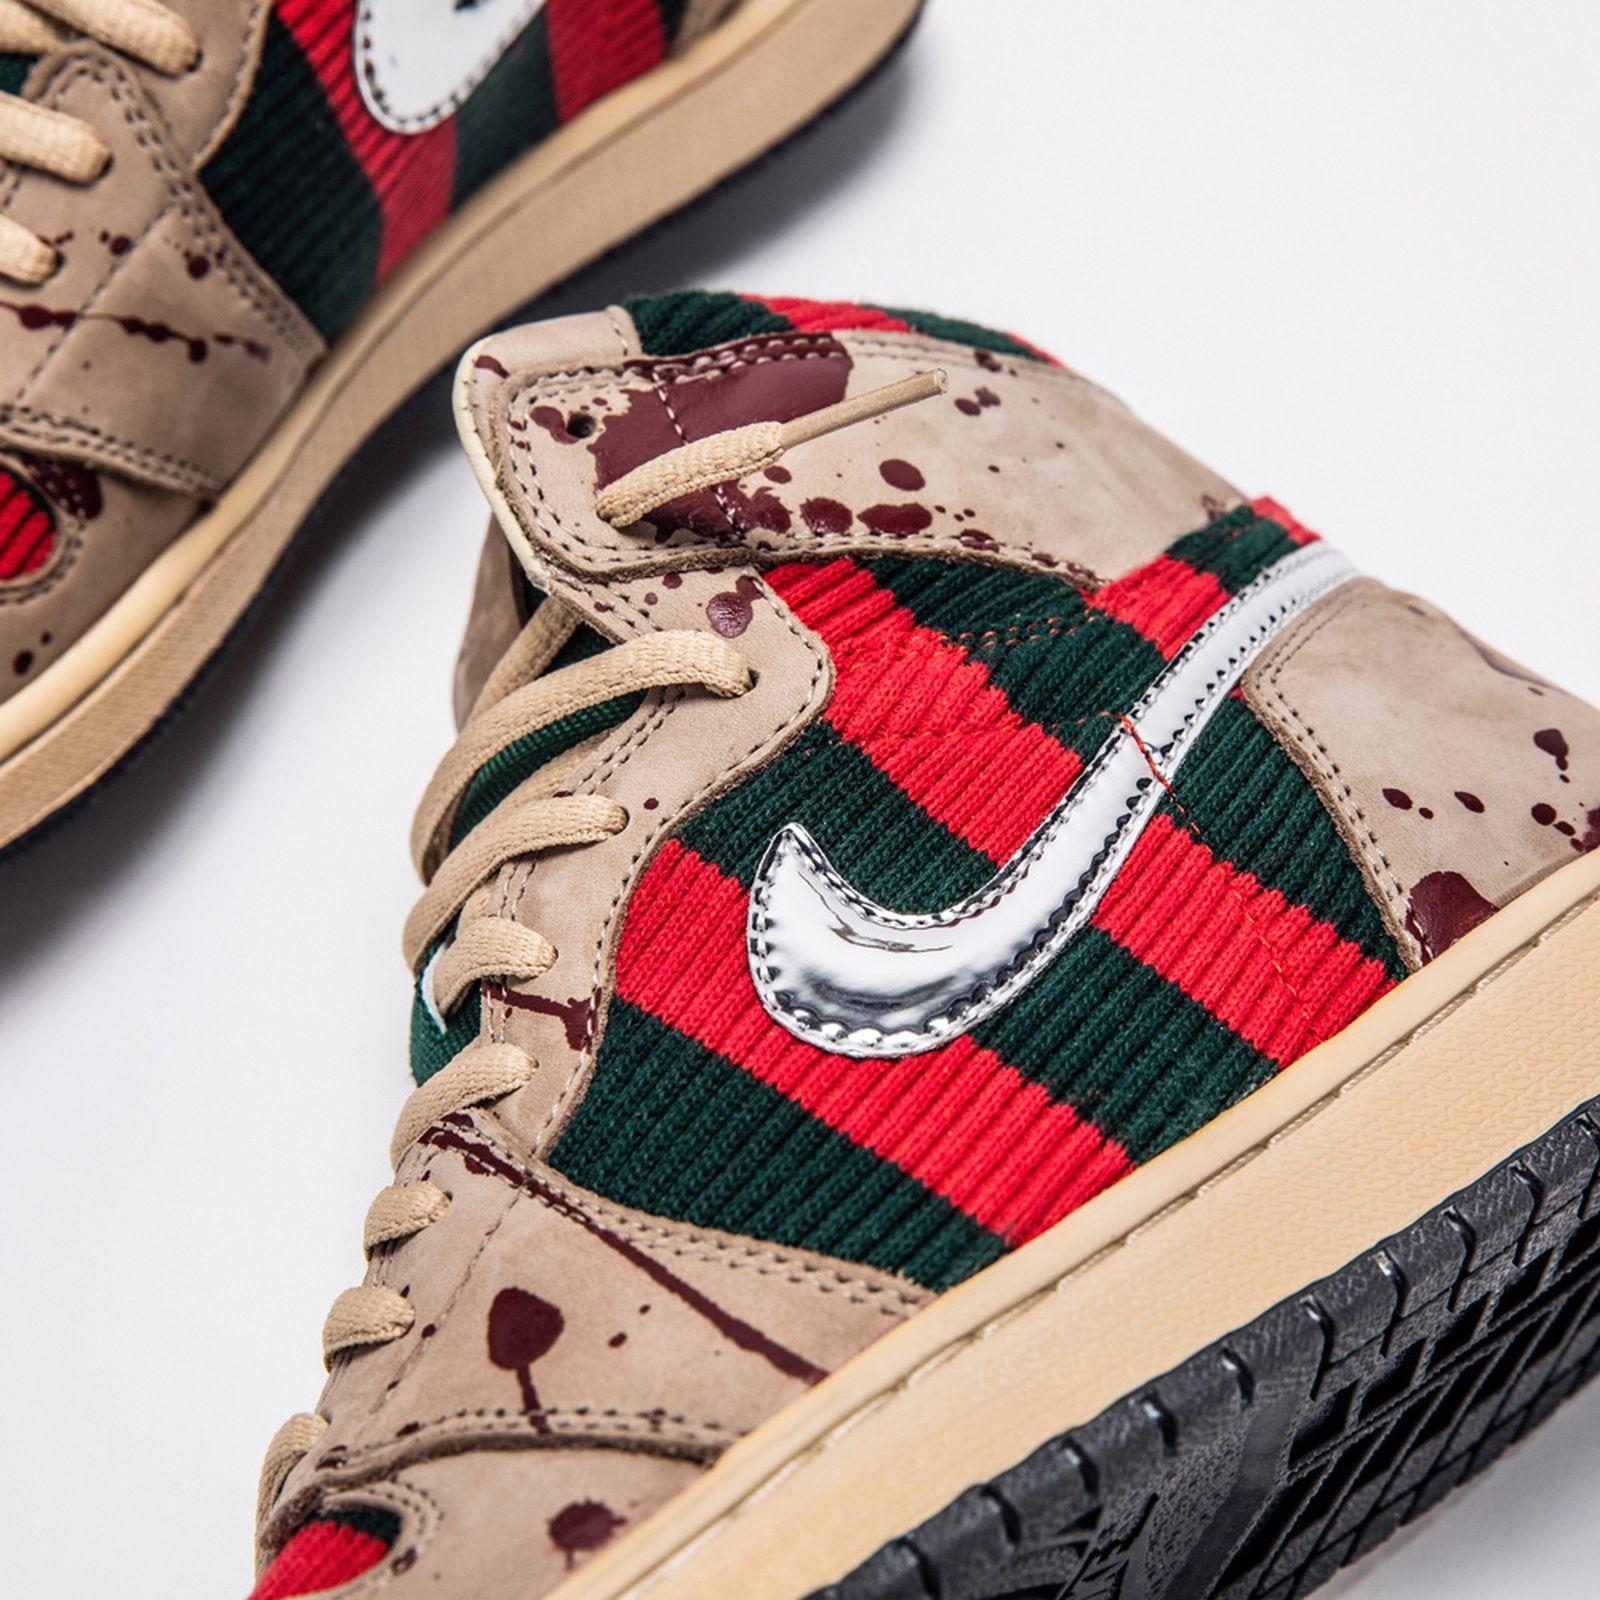 shoe-surgeon-nike-air-jordan-1-freddy-krueger-release-date-price-06